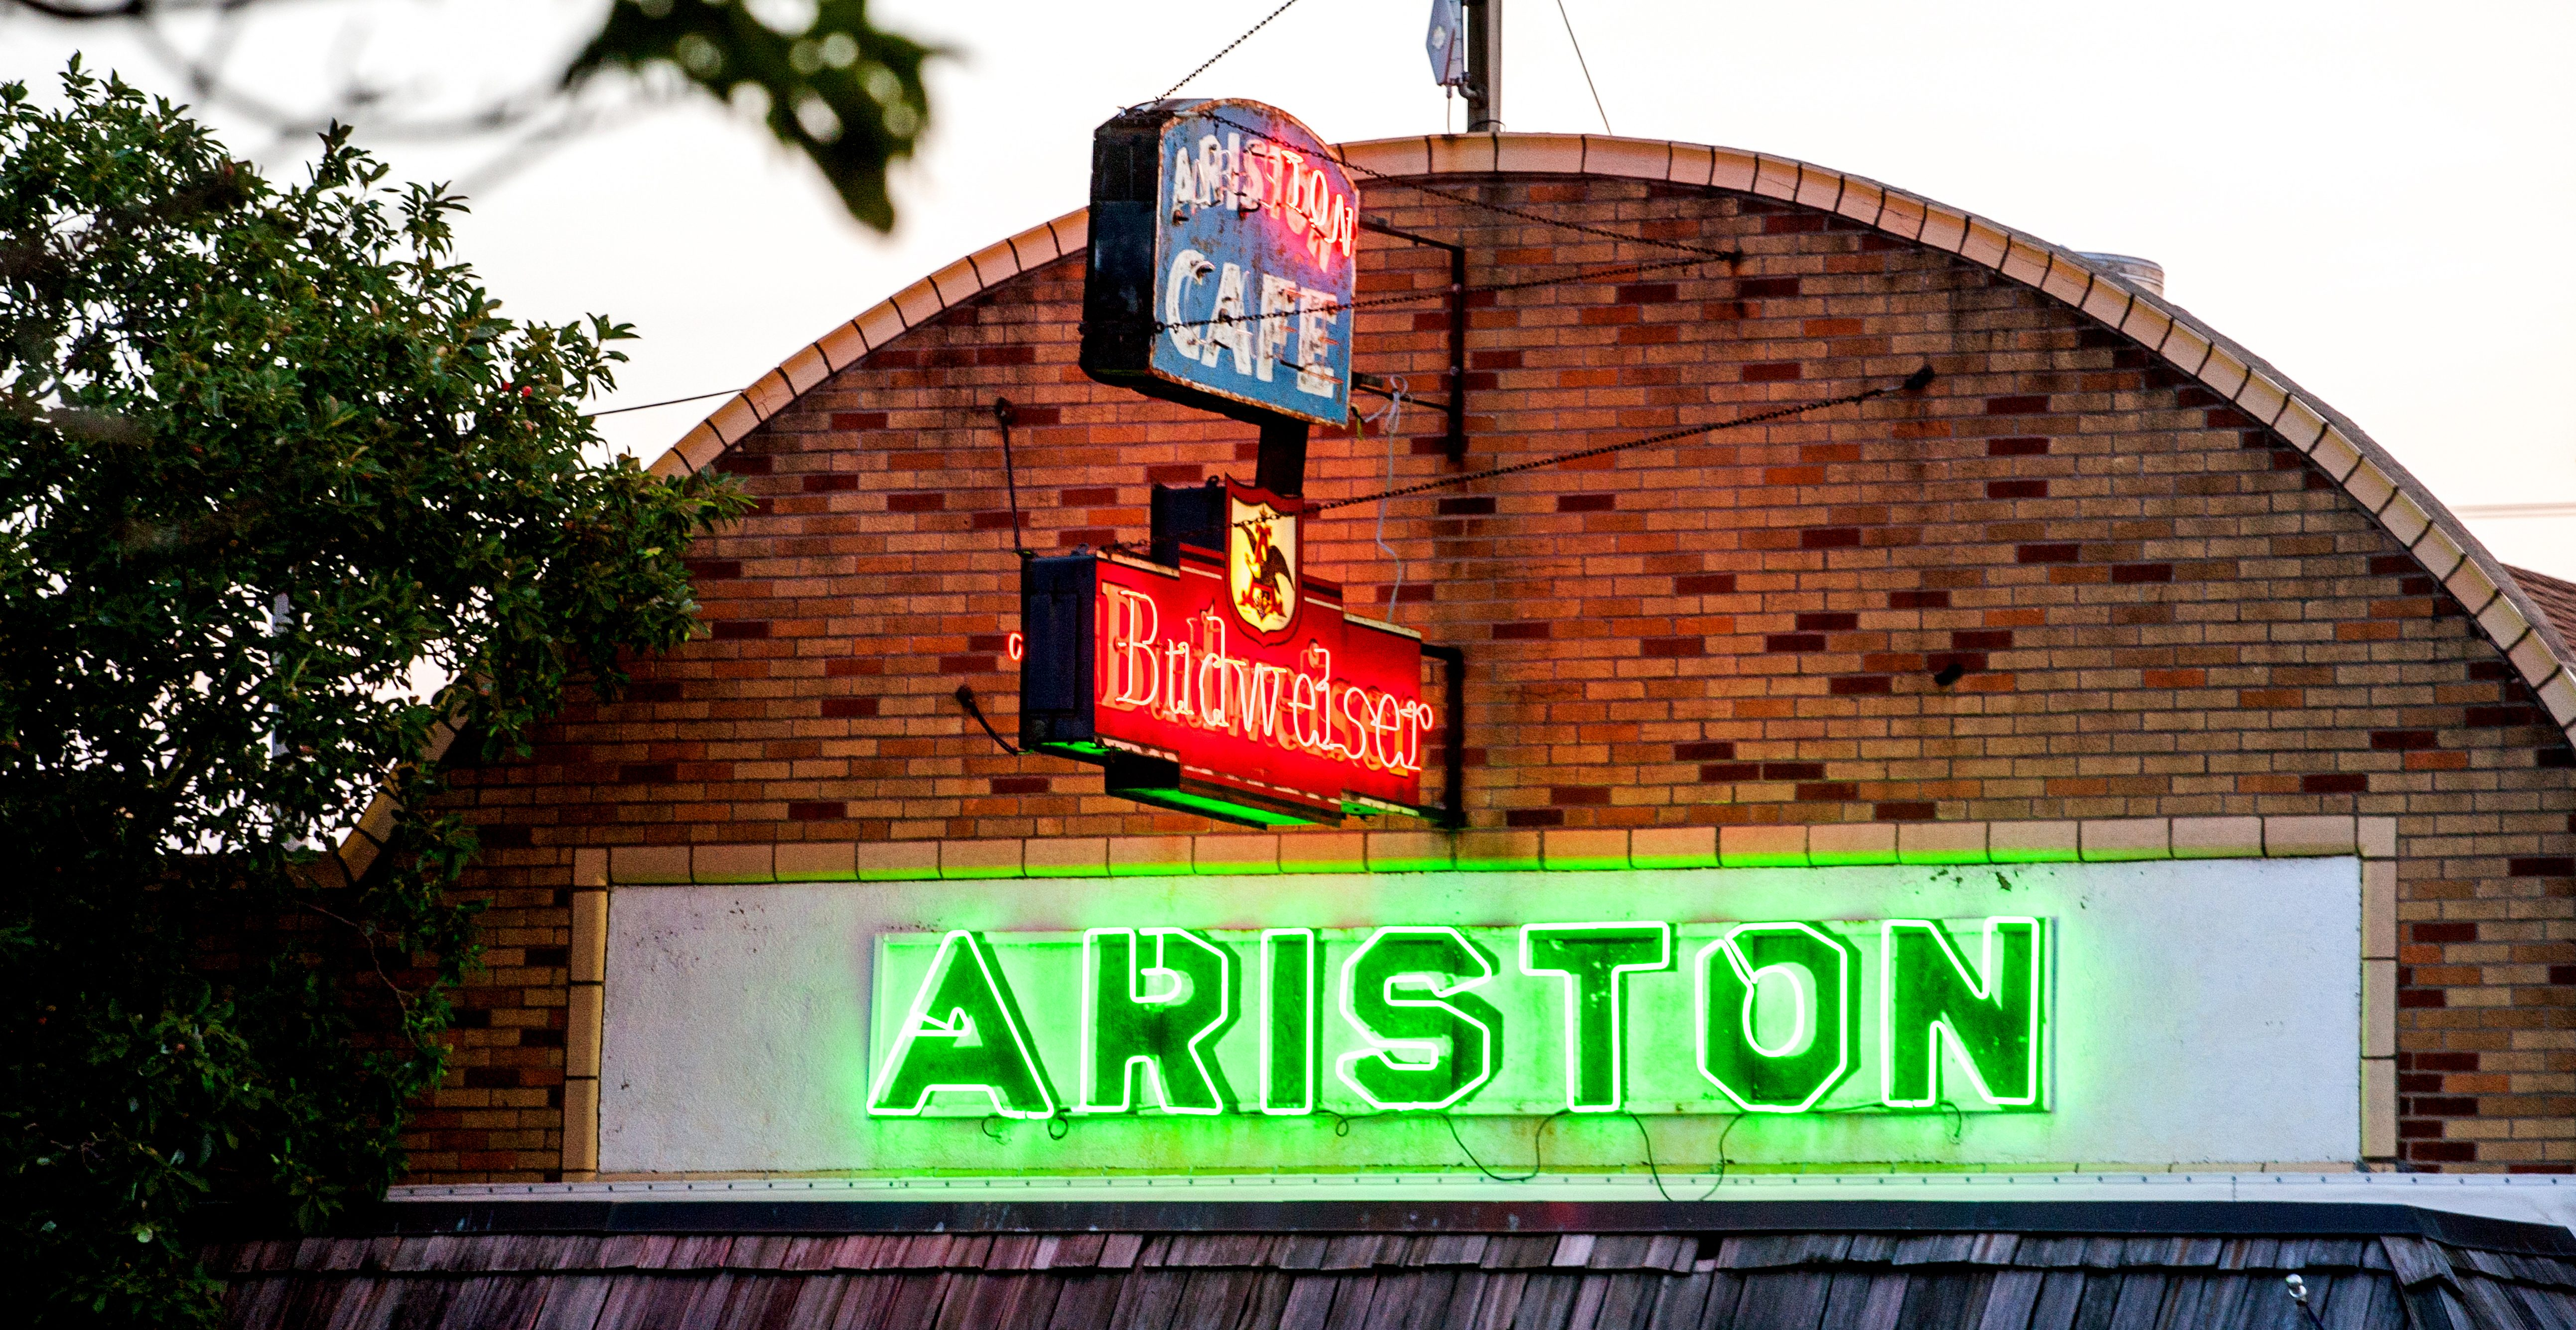 Neon lights at the Ariston Cafe